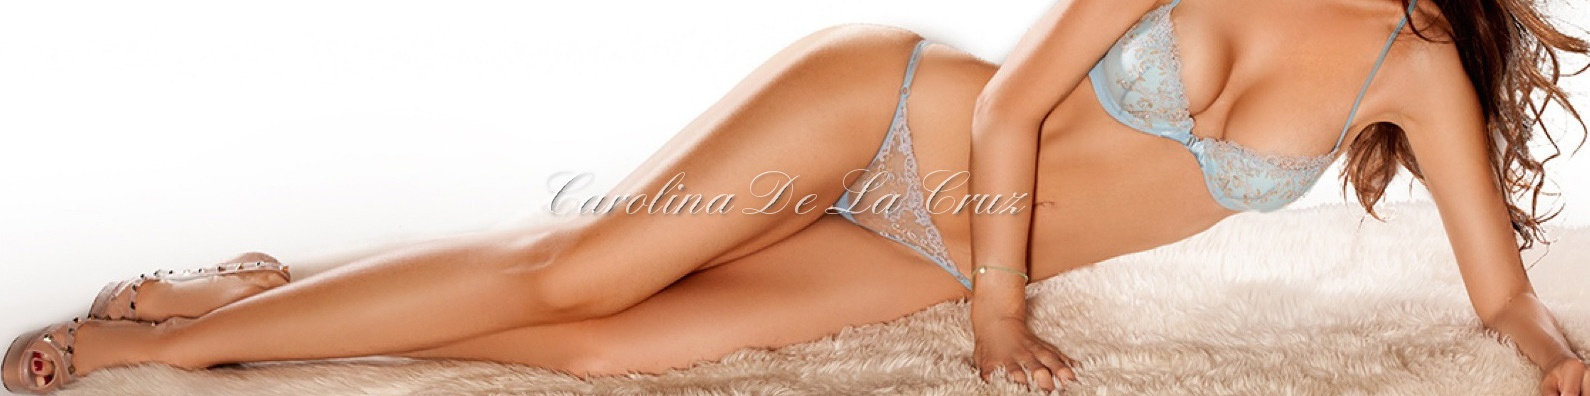 Carolina De La Cruz's Cover Photo